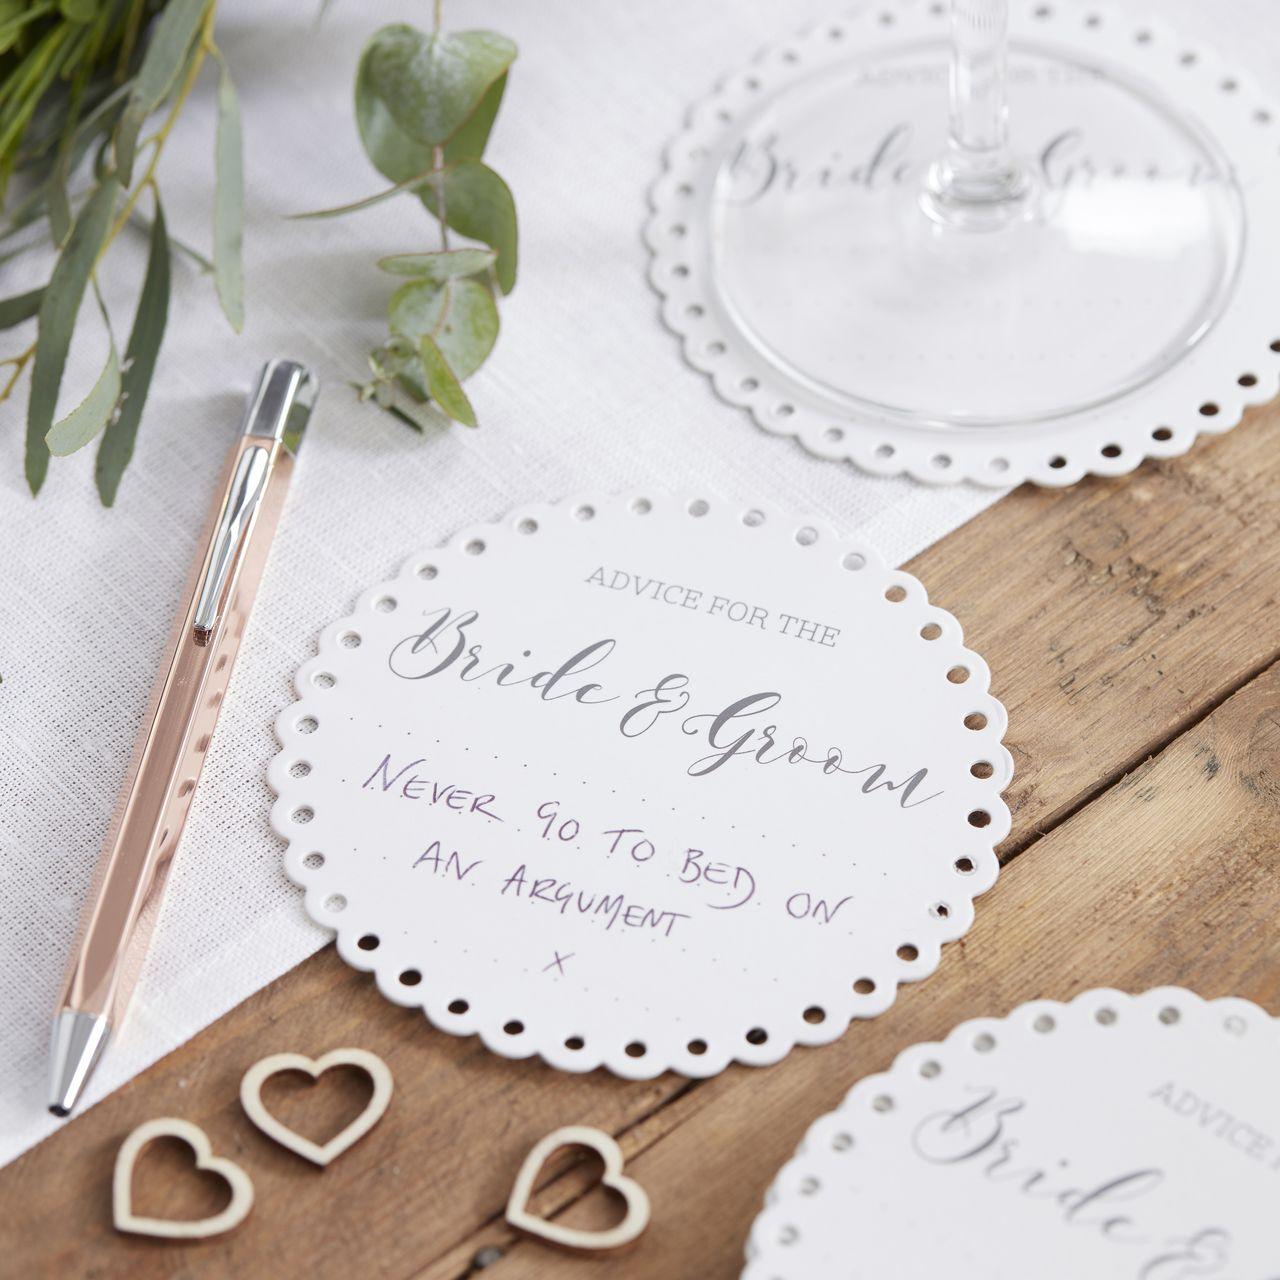 Advice For The Bride & Groom Coasters - A Wedding Less Ordinary ...